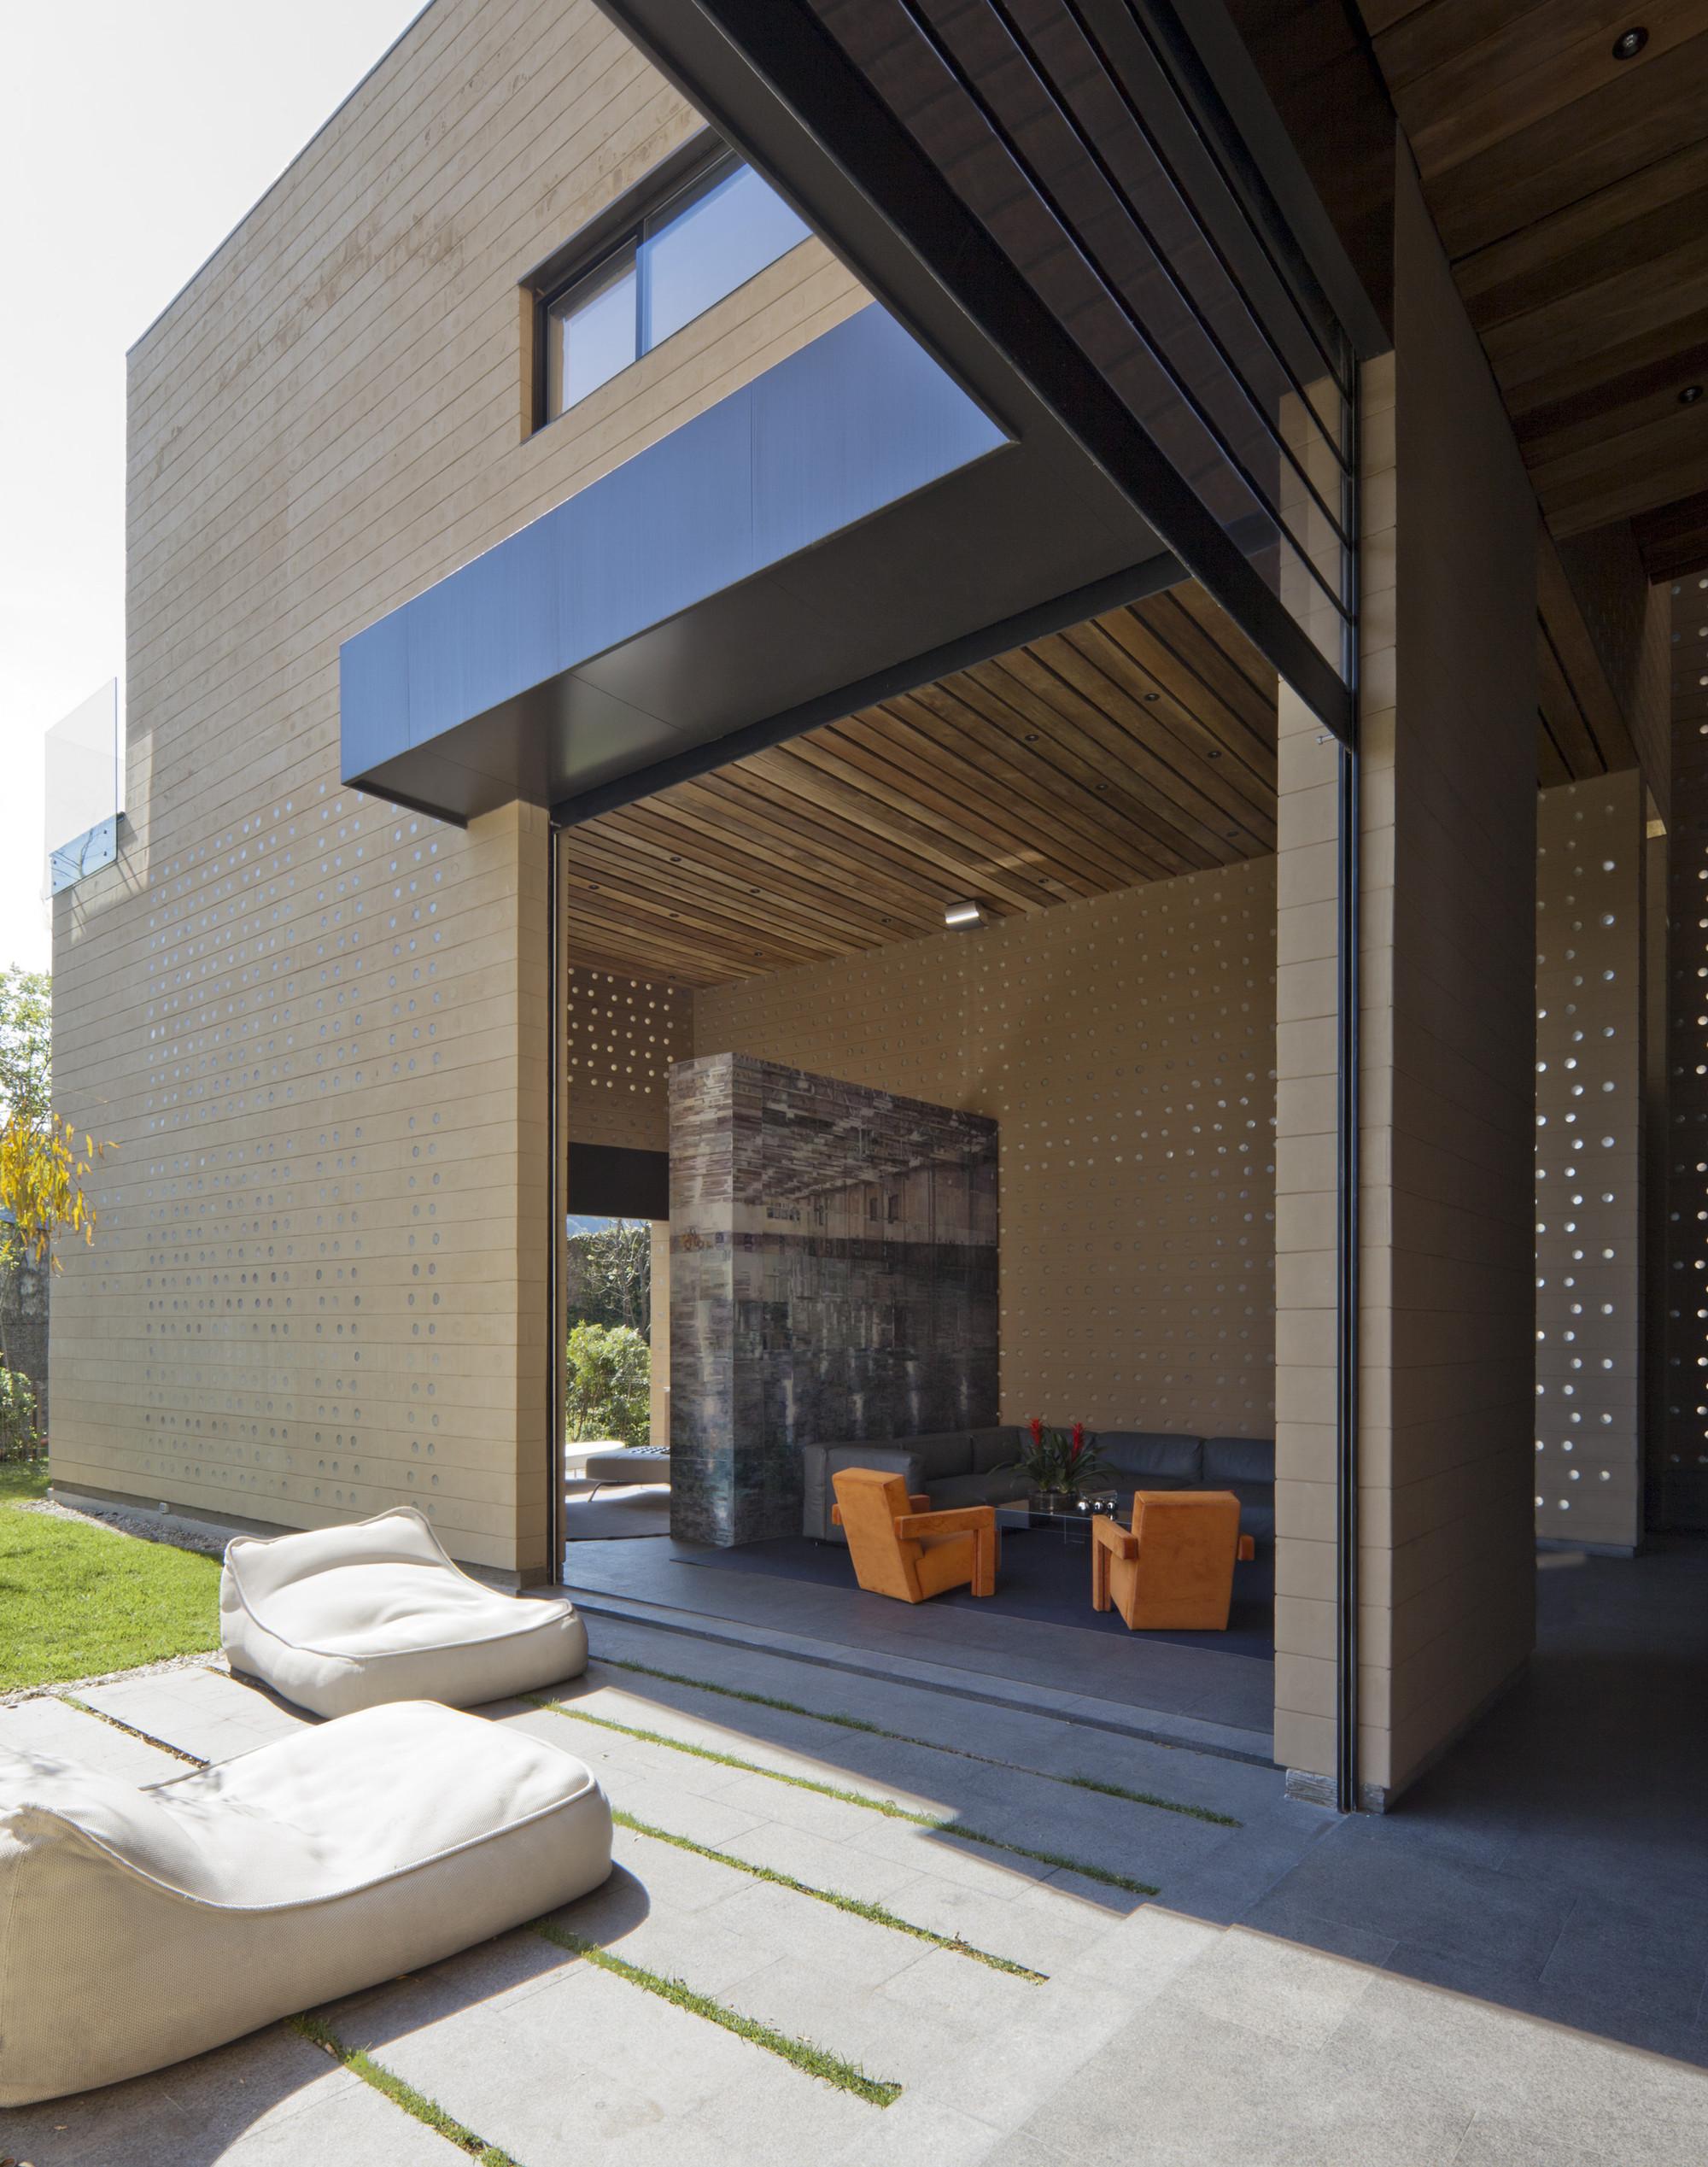 Galeria de casa tierra serrano monjaraz arquitectos 7 for Arquitectos para casas